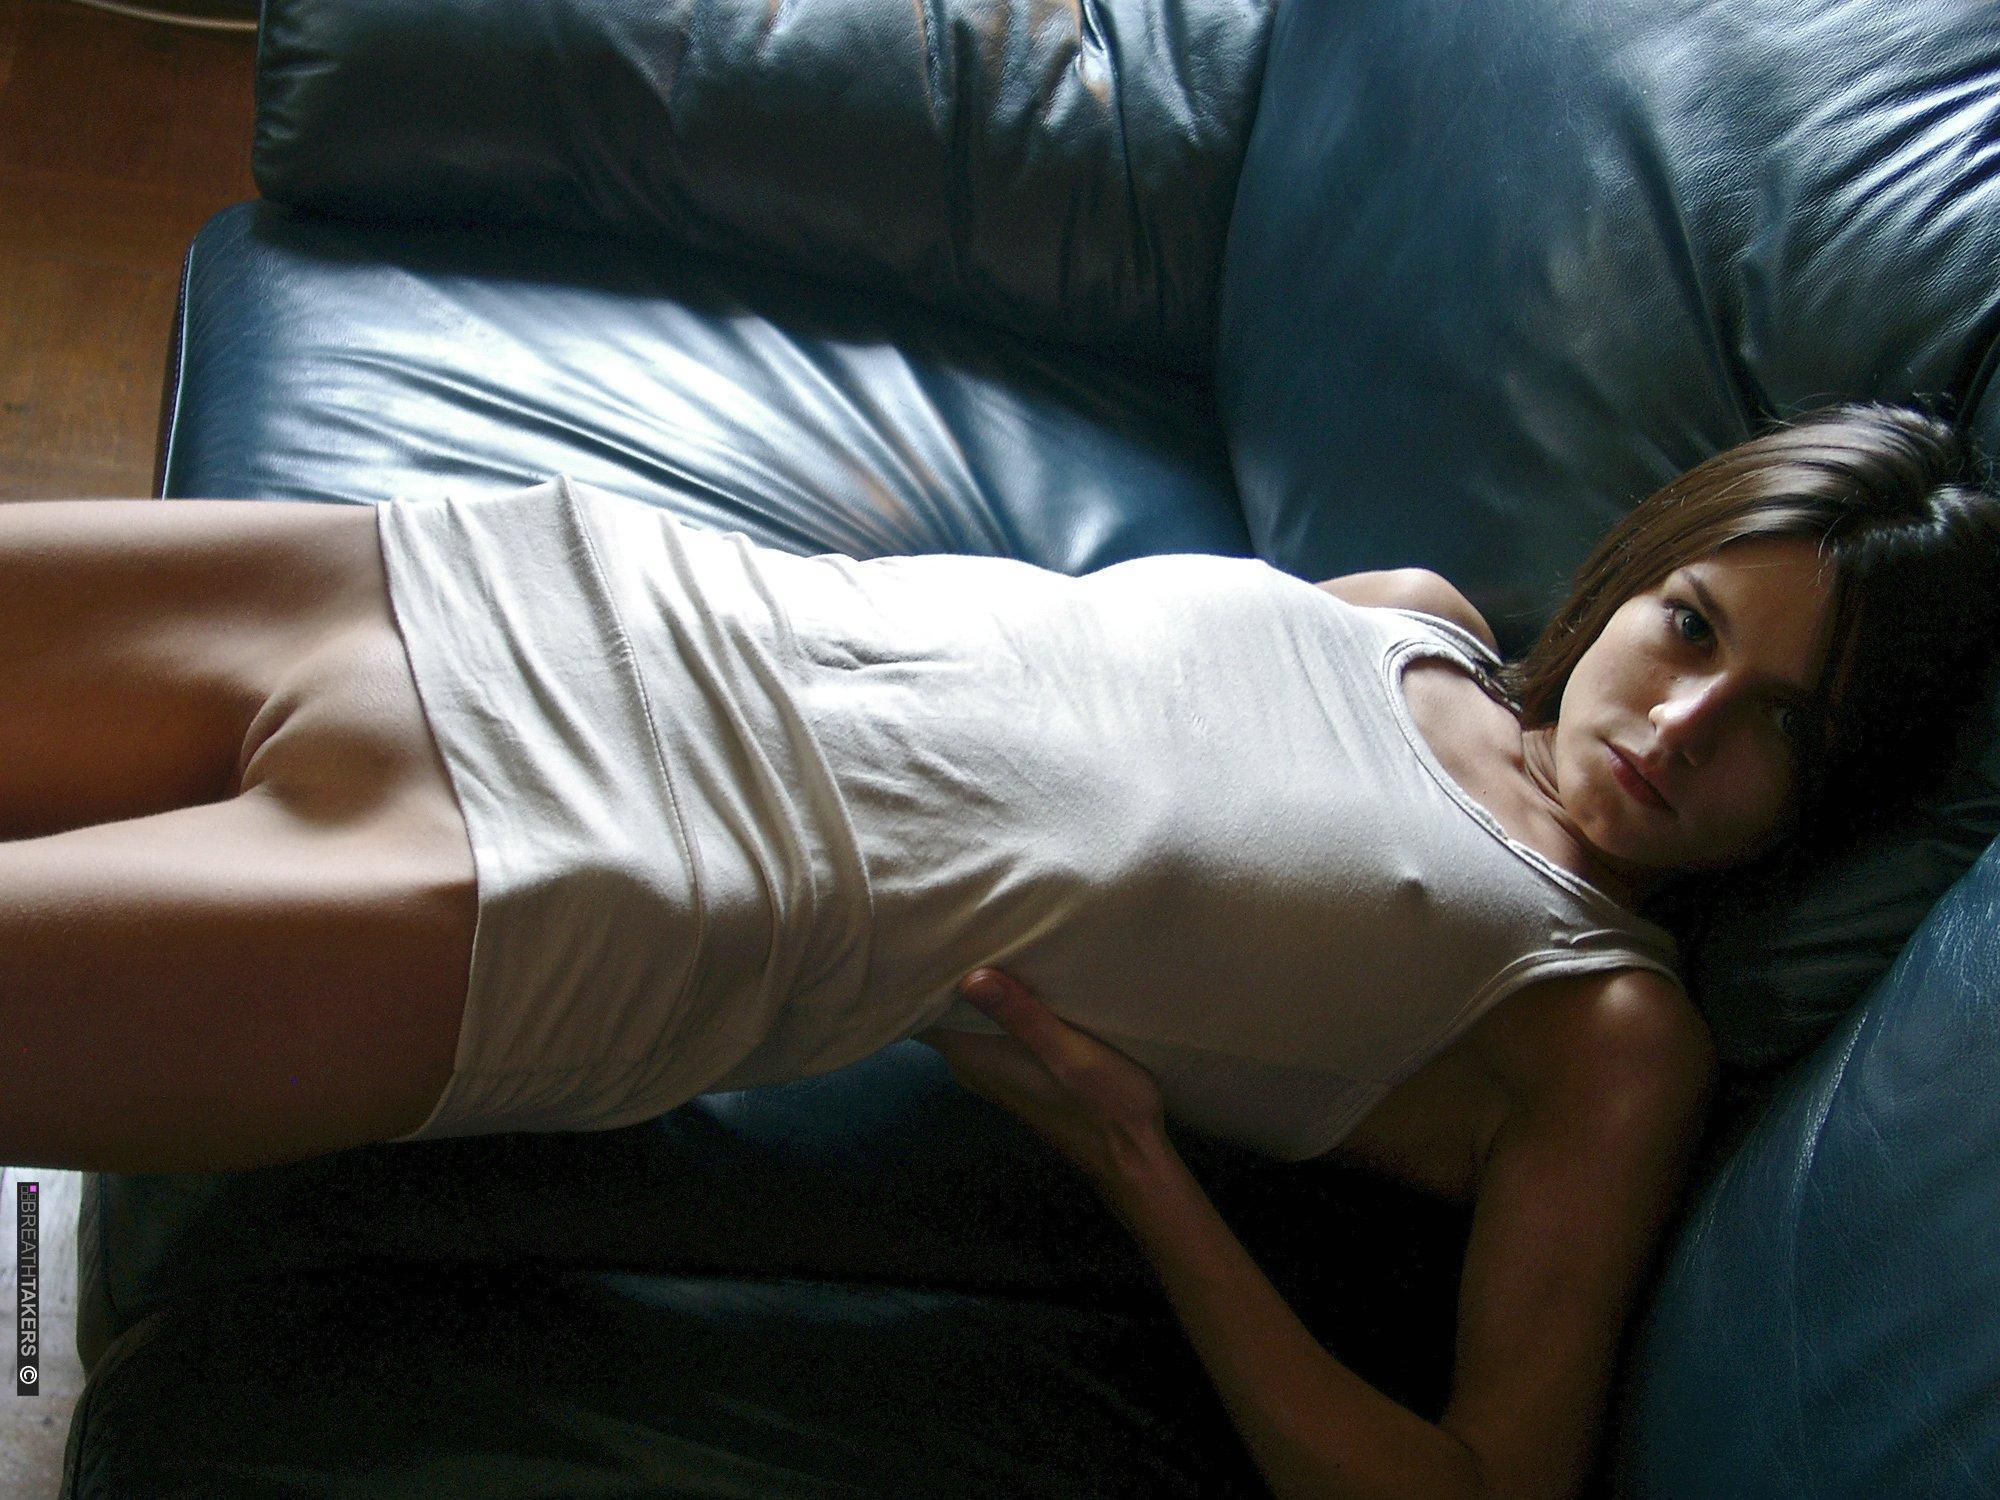 Porn mons pubis, free gps sex videos download